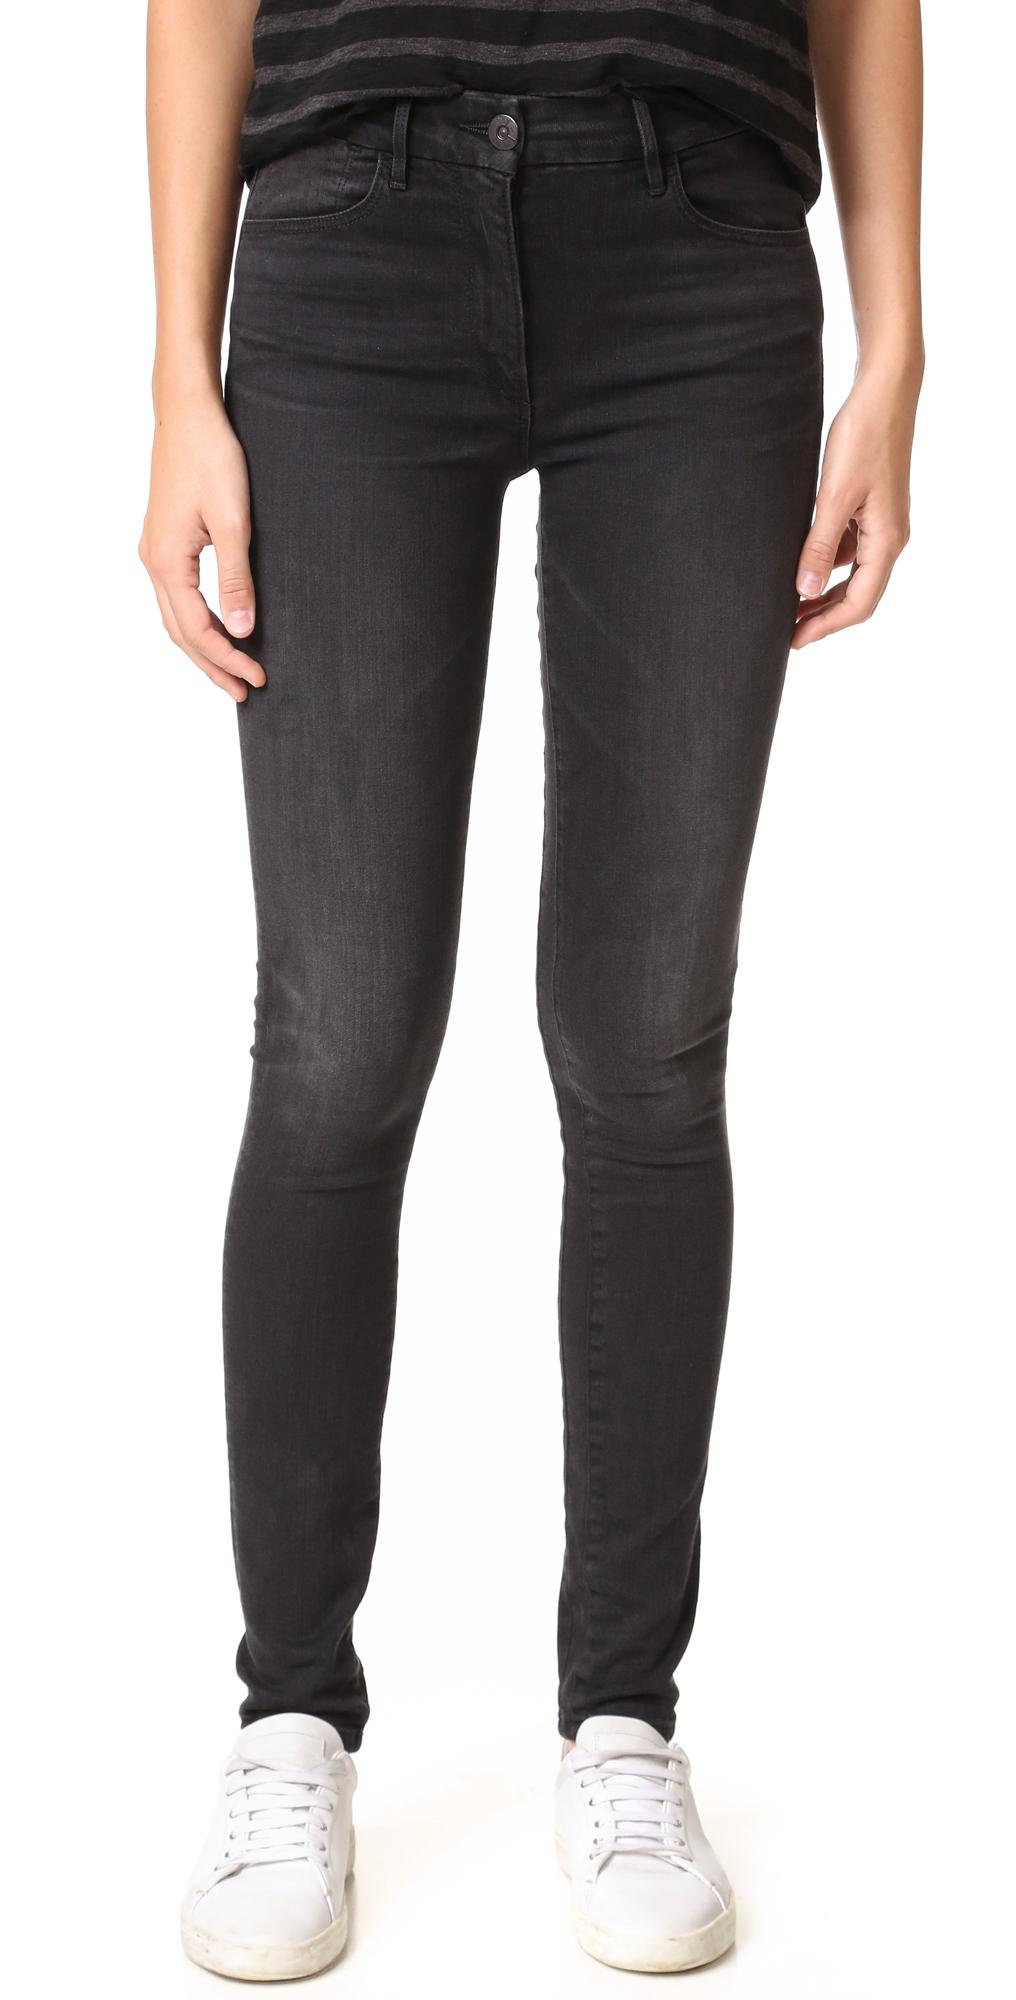 W3 Channel Seam High Rise Skinny Jeans 3x1